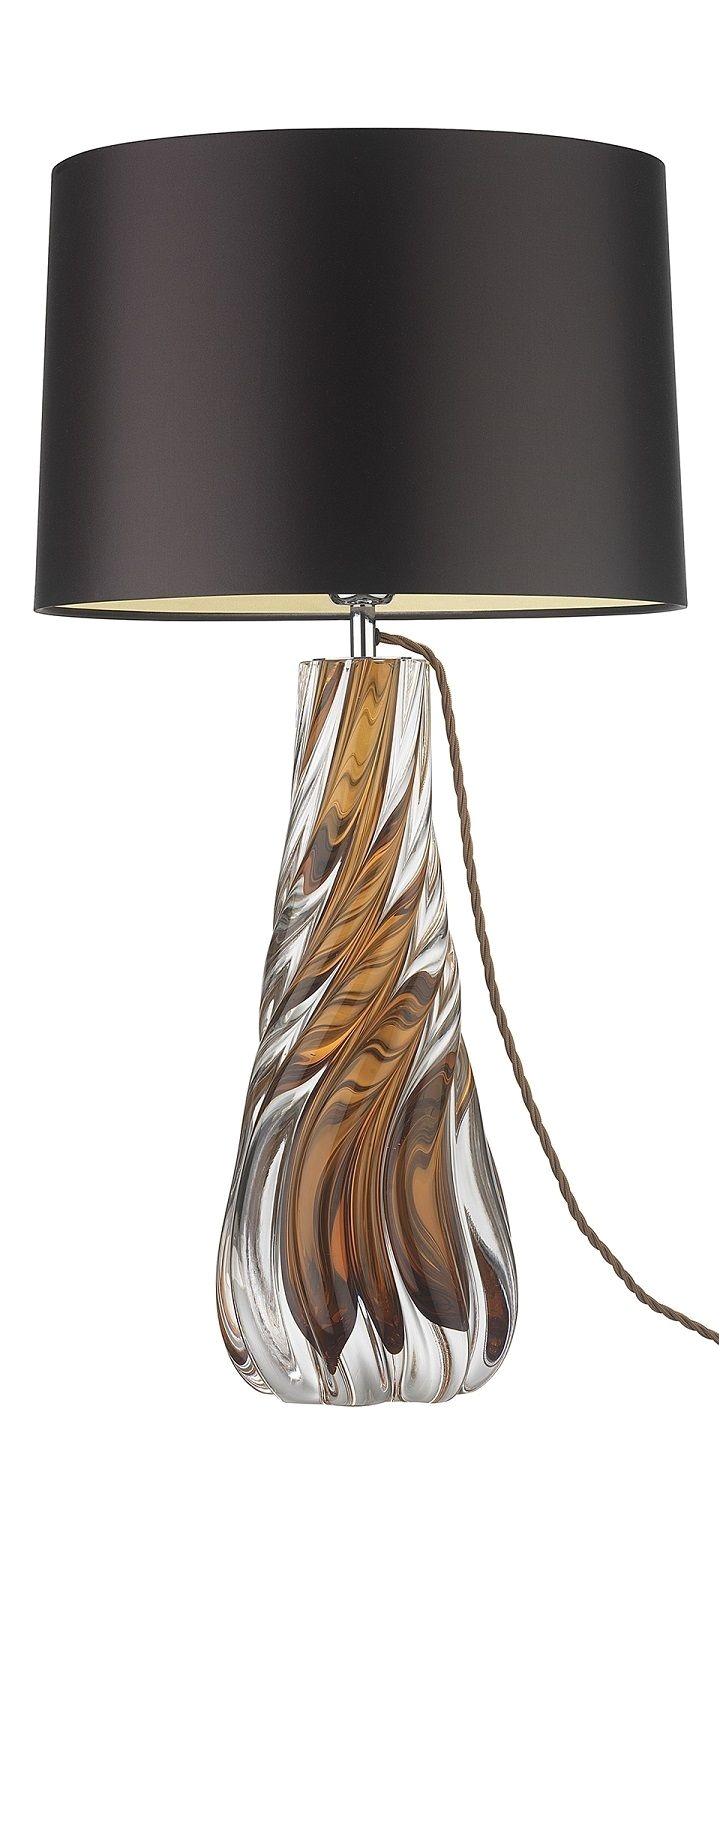 brown lamp brown lamps brown lamps for sale modern lighting